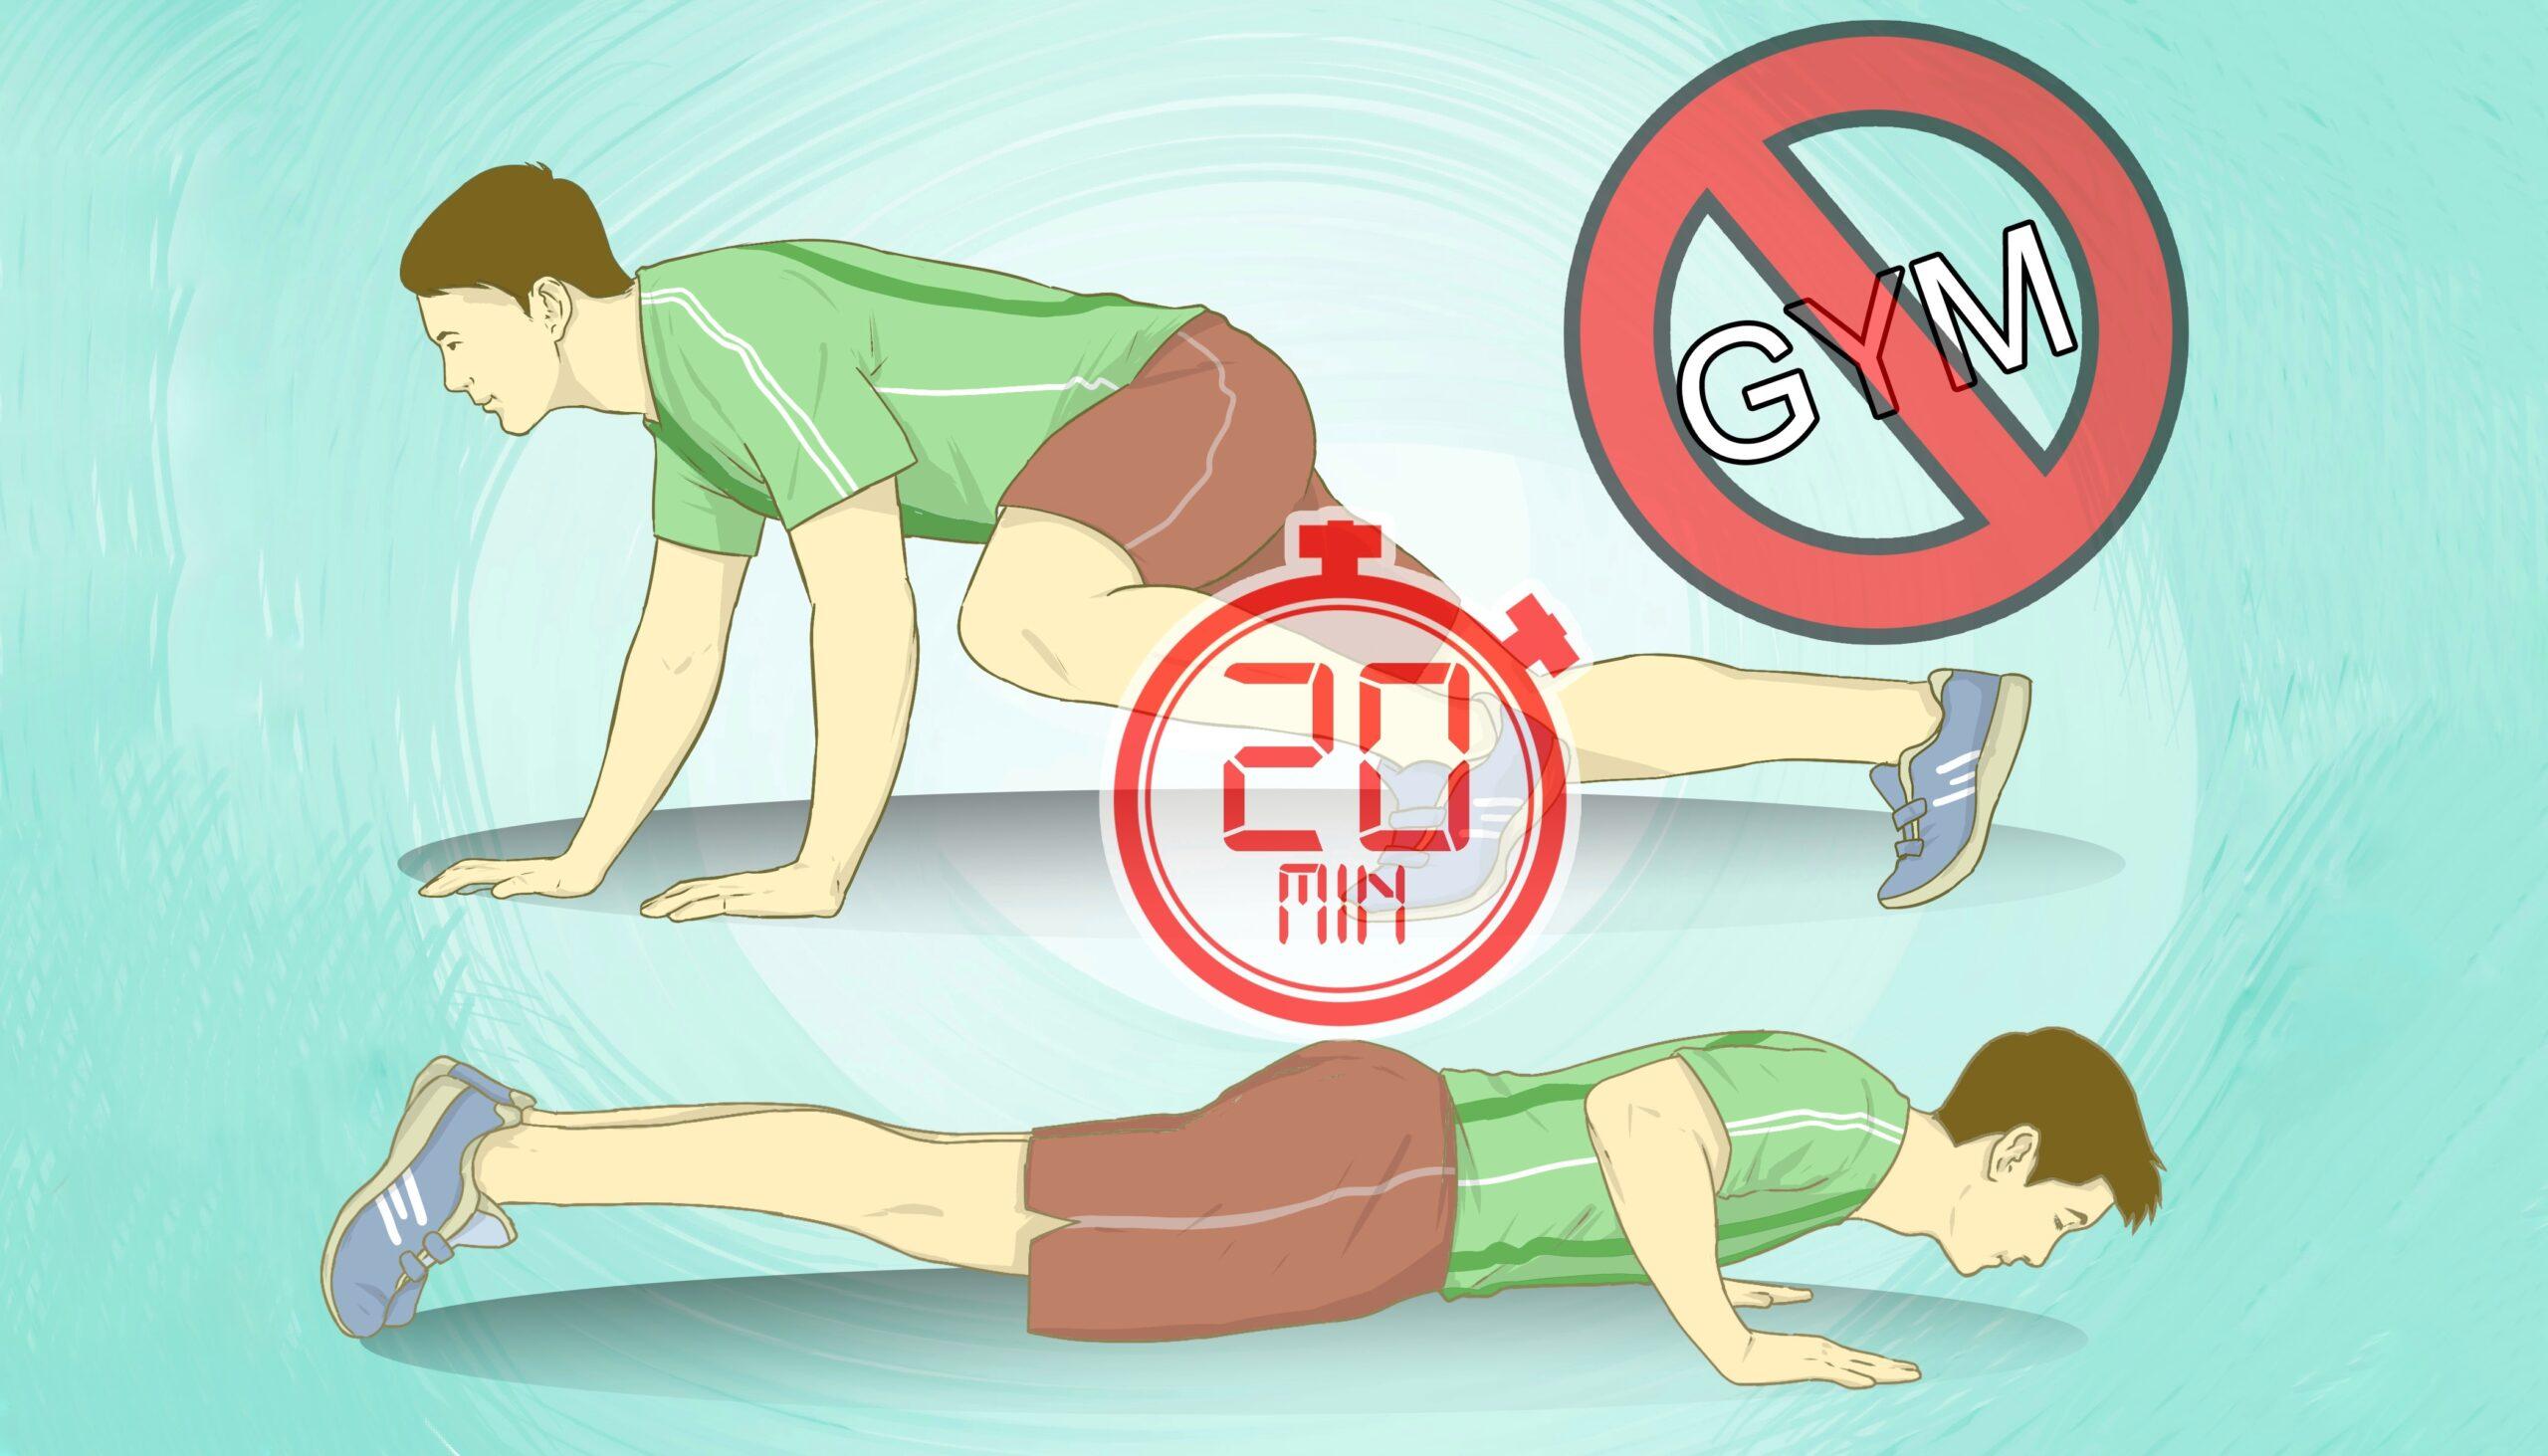 Full Body home Workout For Men